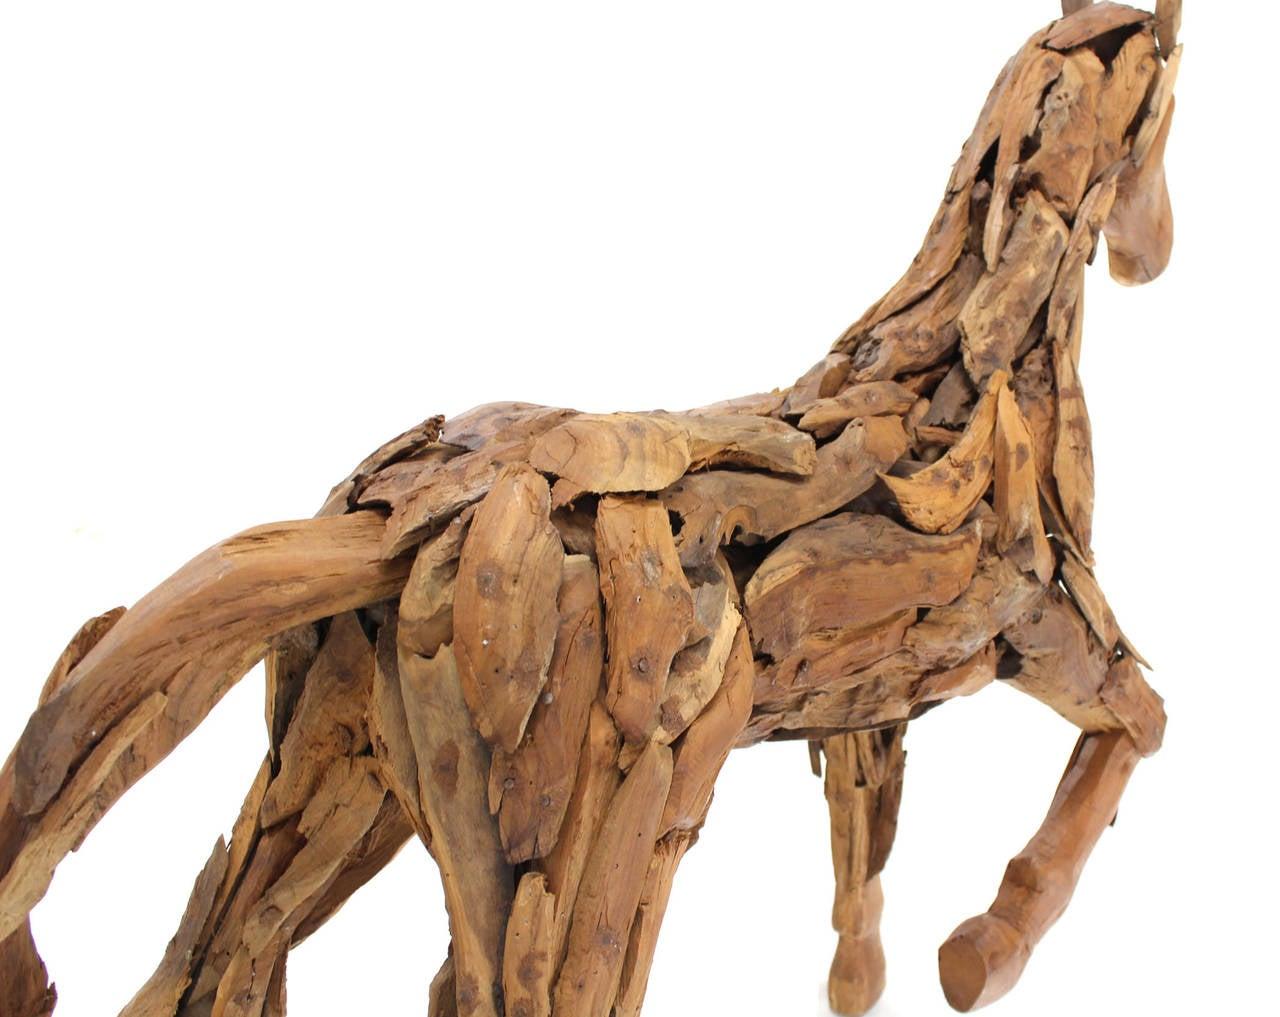 Reclaimed Wood Folk Art Horse Sculpture For Sale At 1stdibs